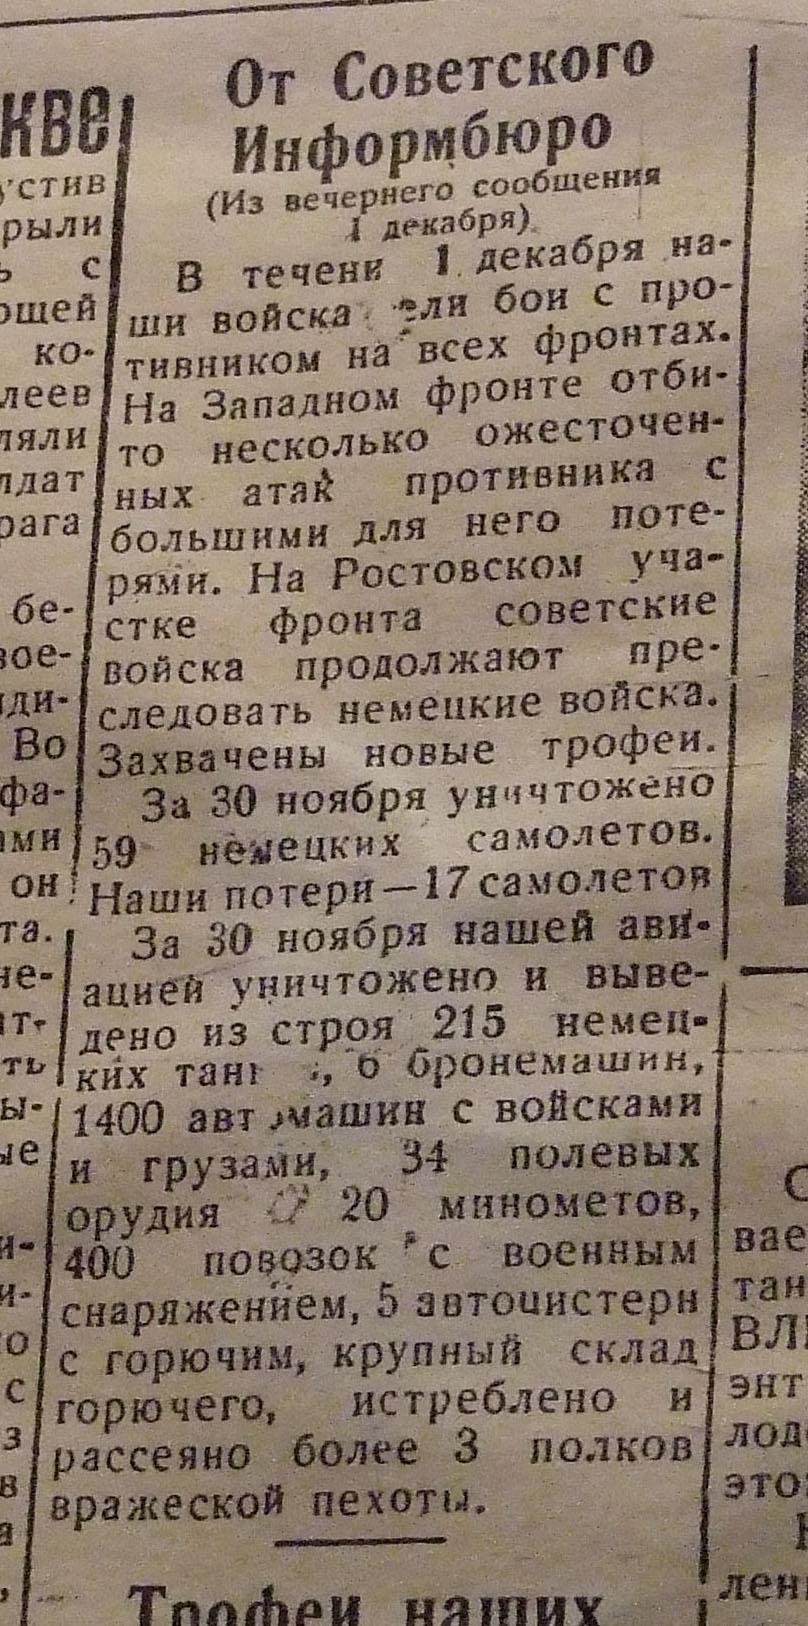 http://s1.uploads.ru/cpwrP.jpg